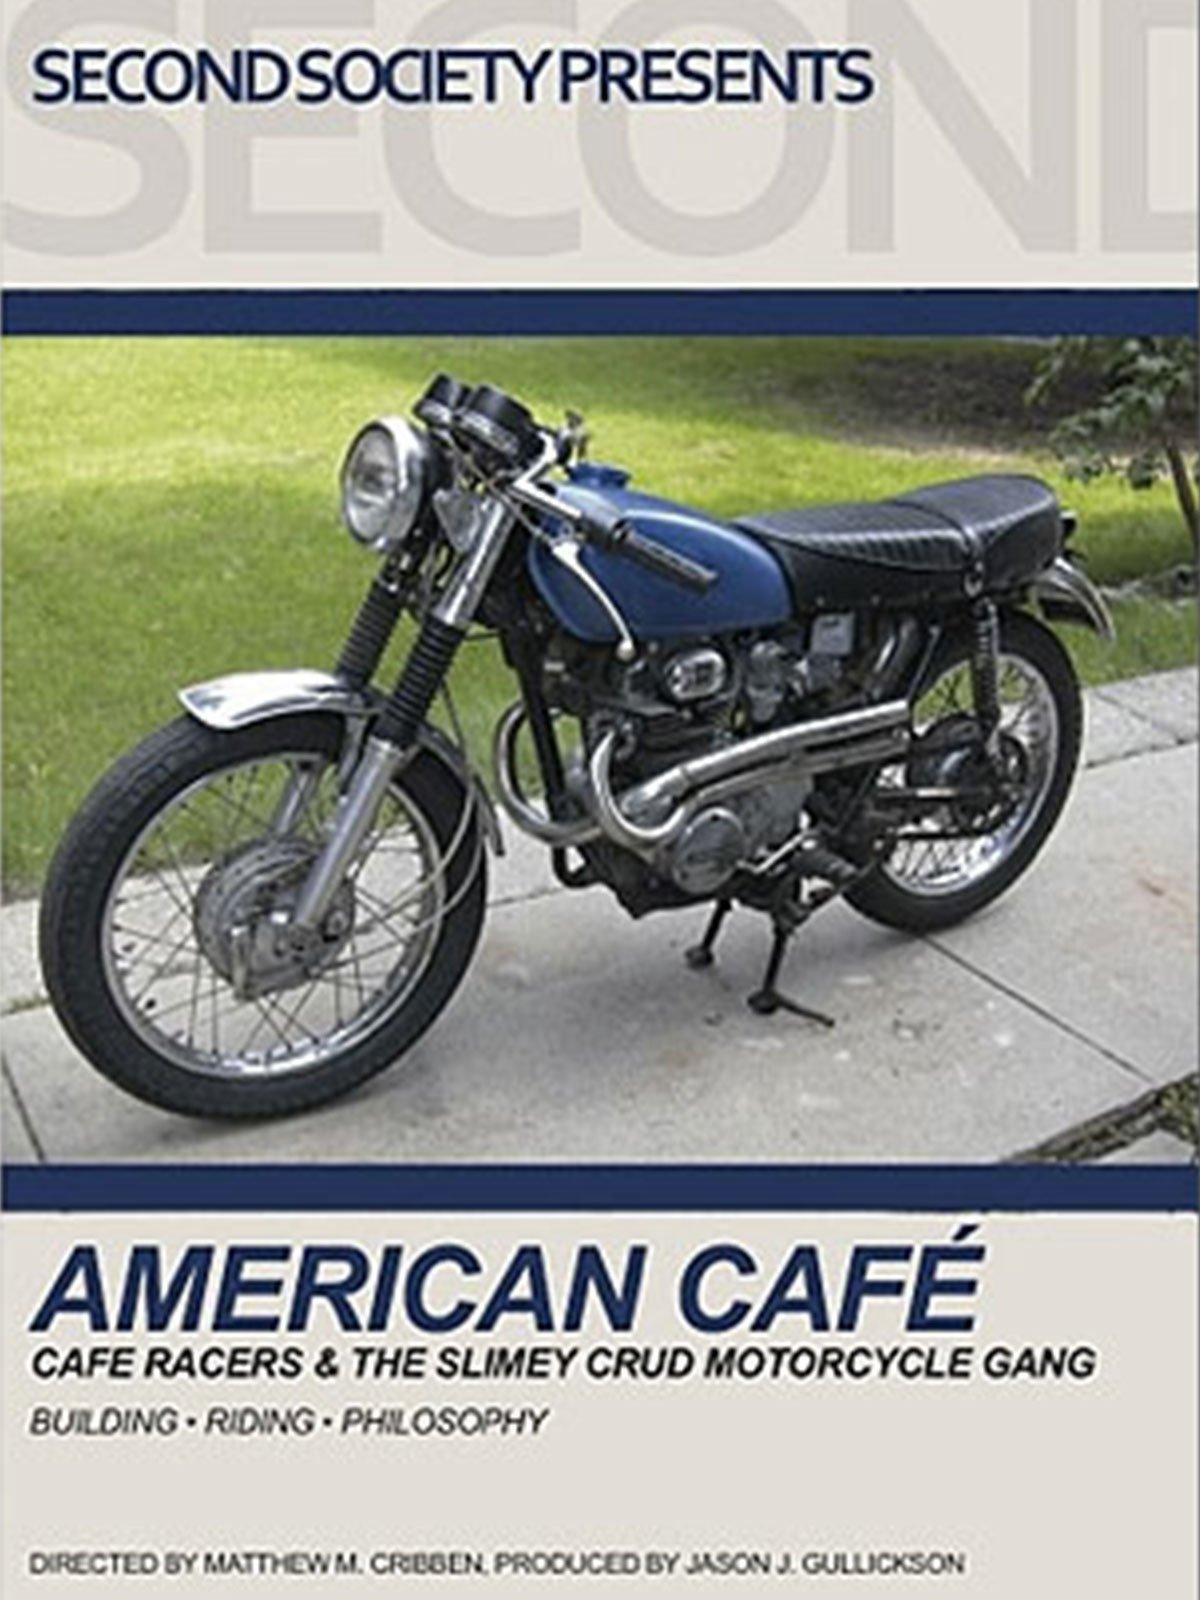 American Café: Café racers & the Slimey Crud Motorcycle Gang